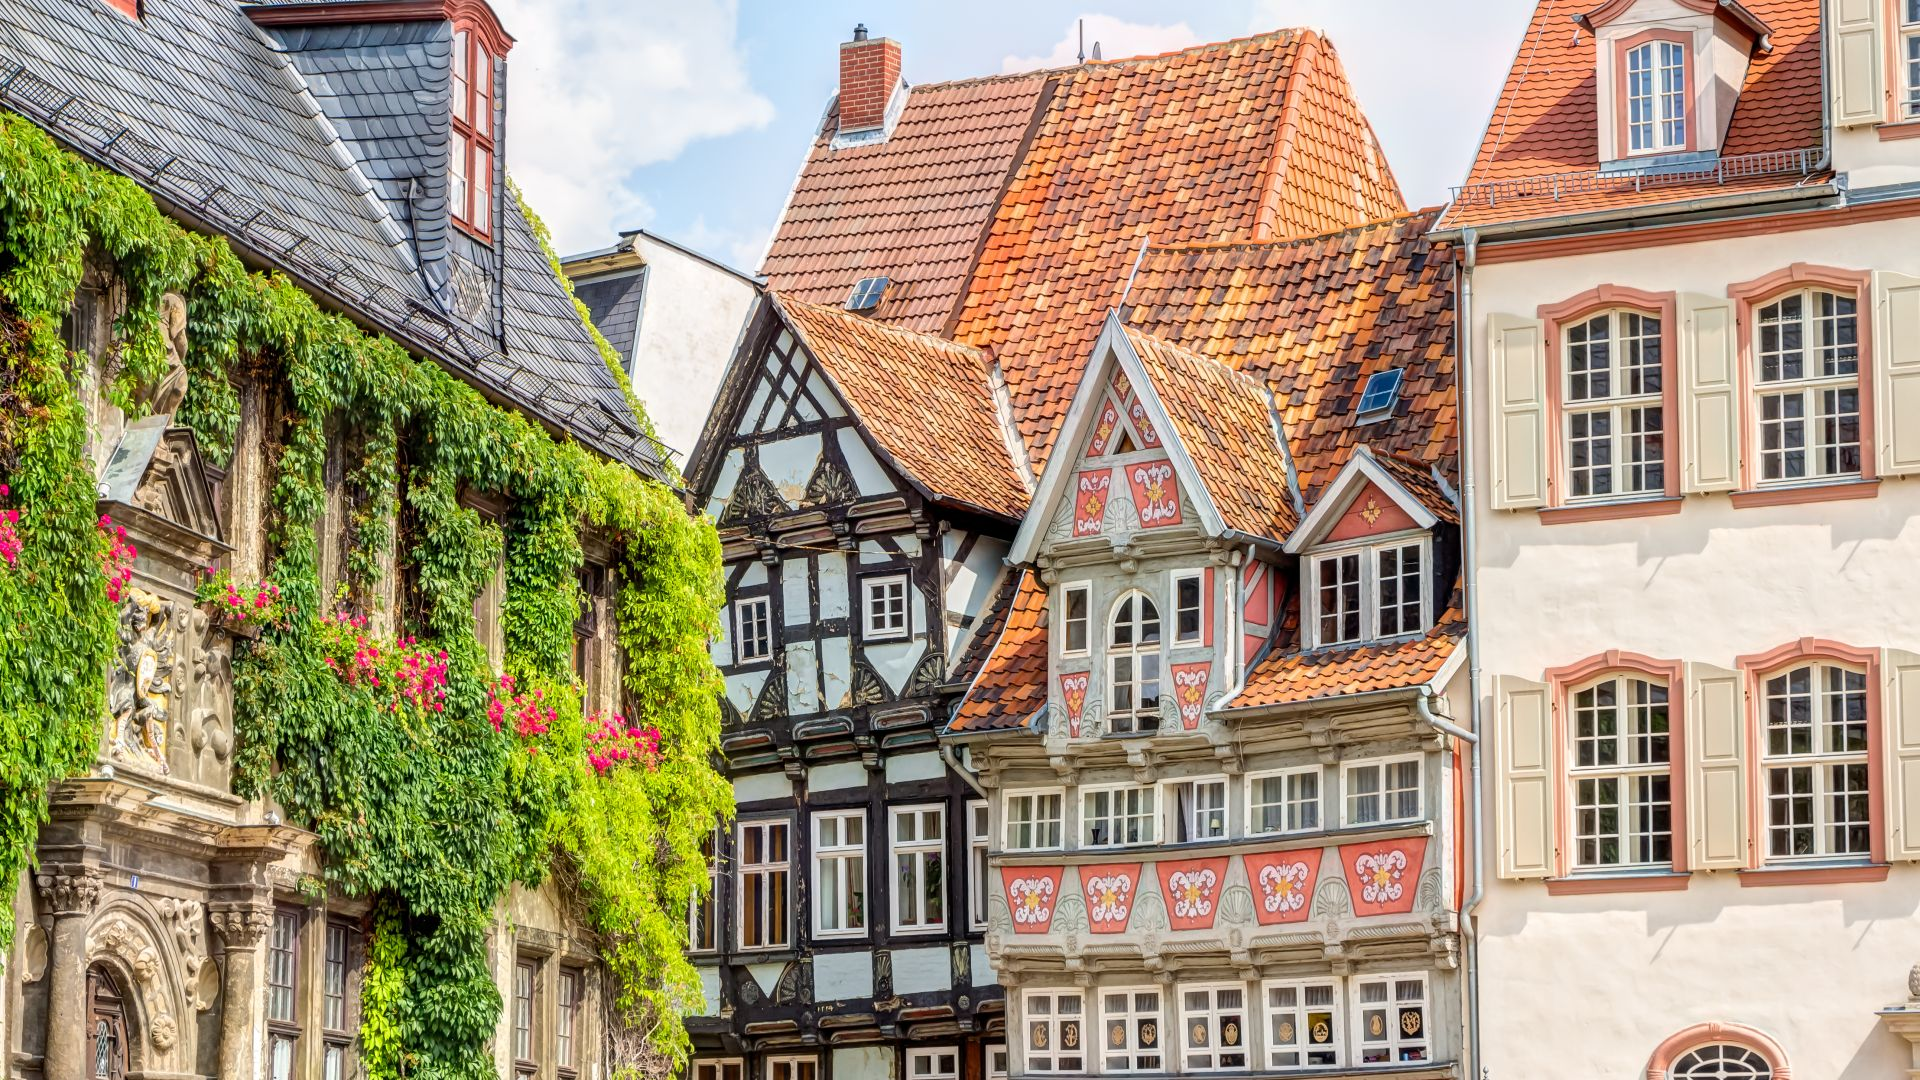 Timber framing houses Quedlinburg old town, Germany